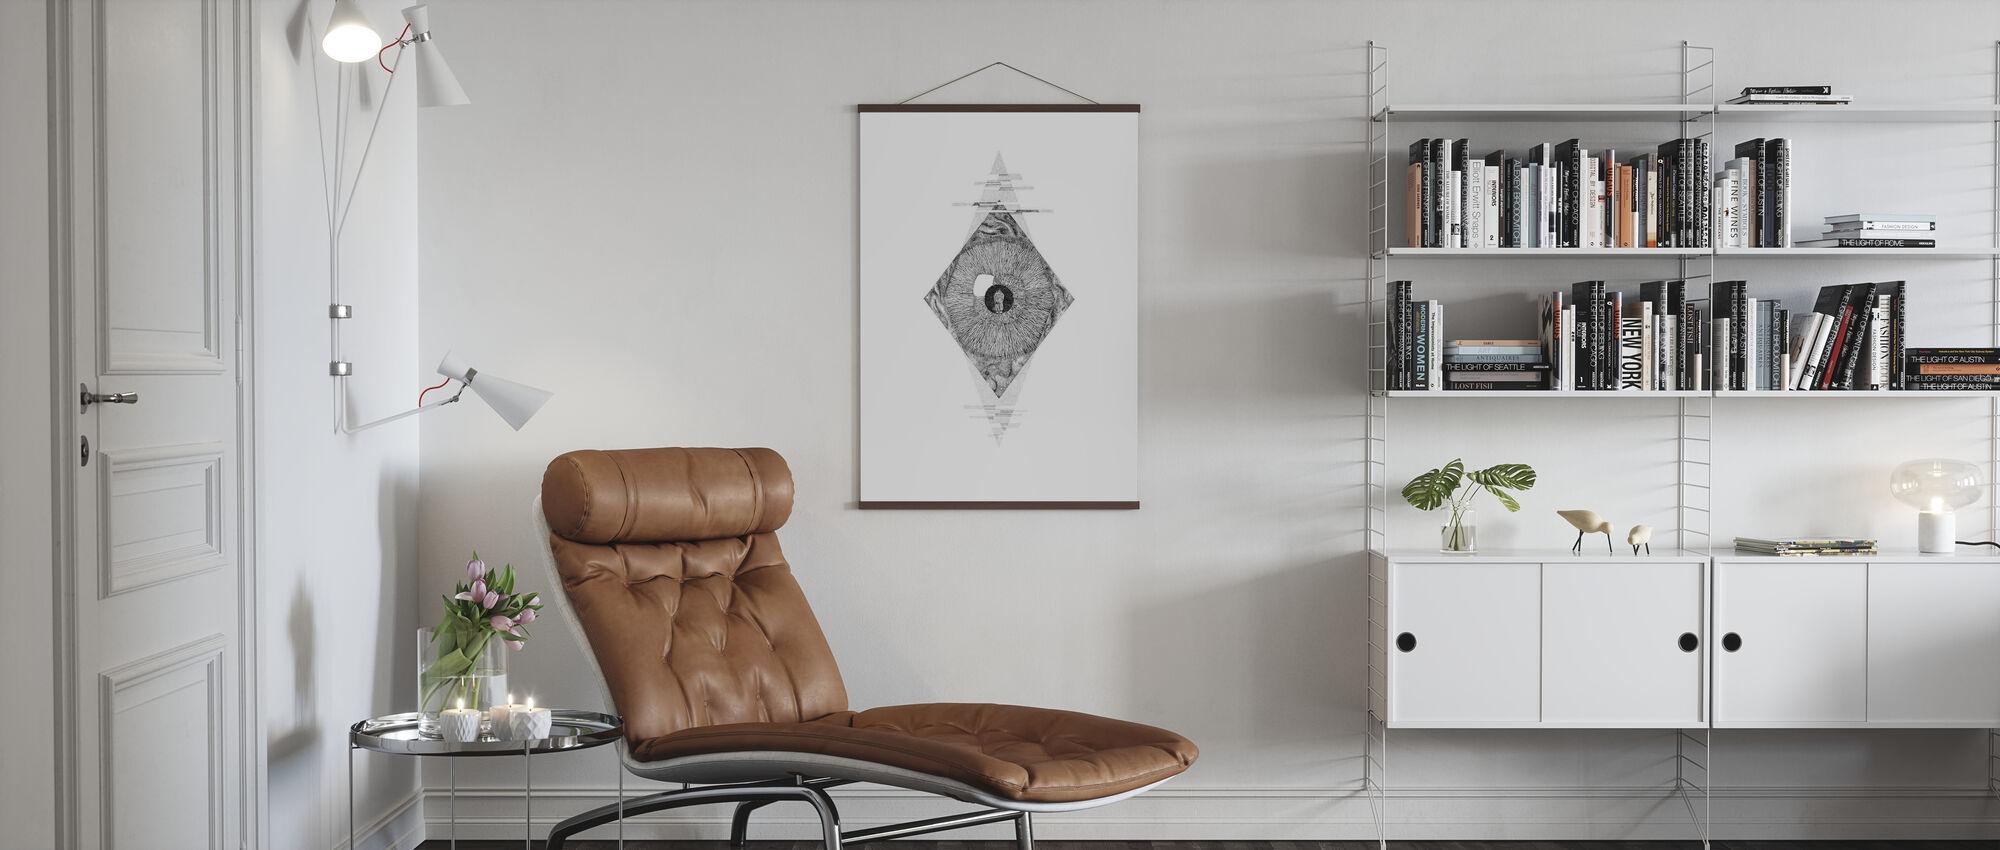 Onderbroken Universum IV - Poster - Woonkamer